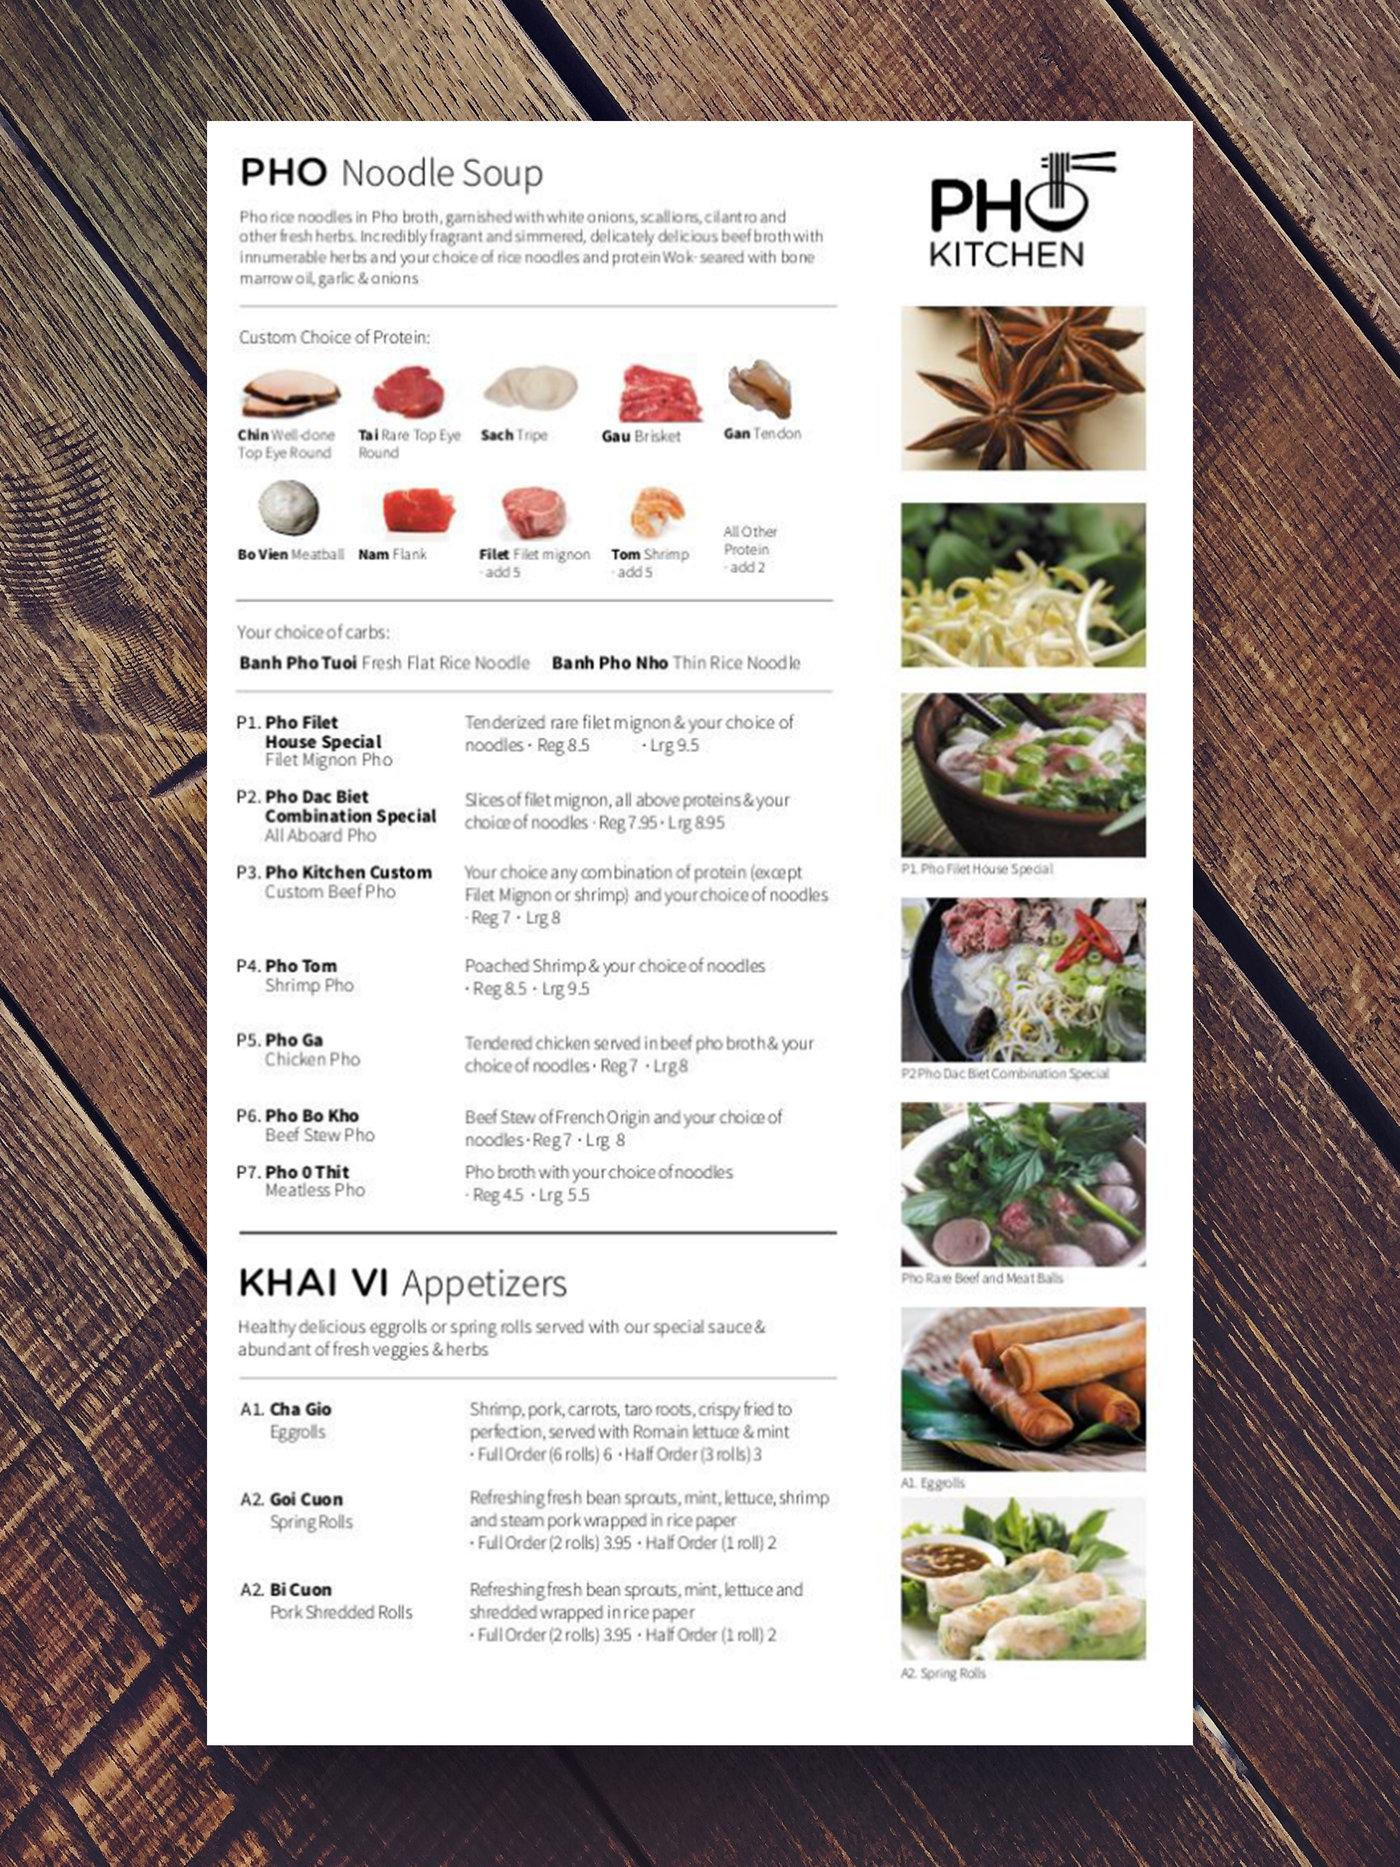 Pho Kitchen Brand By Sara Jenner At Coroflot Com